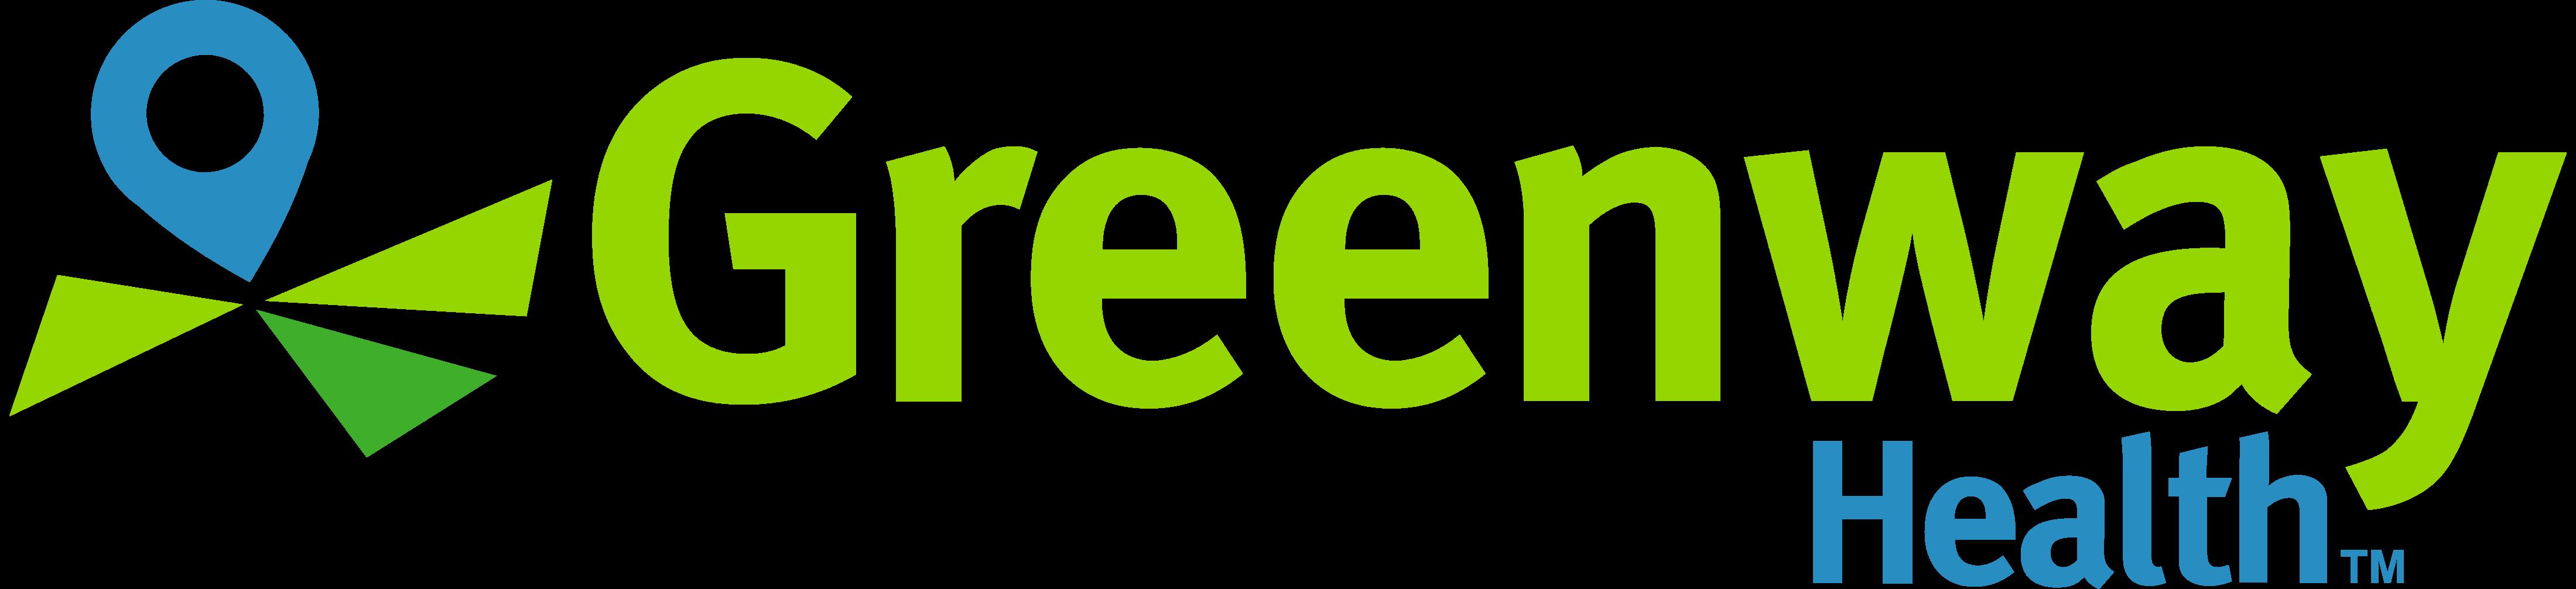 Greenway Health – Logos Download